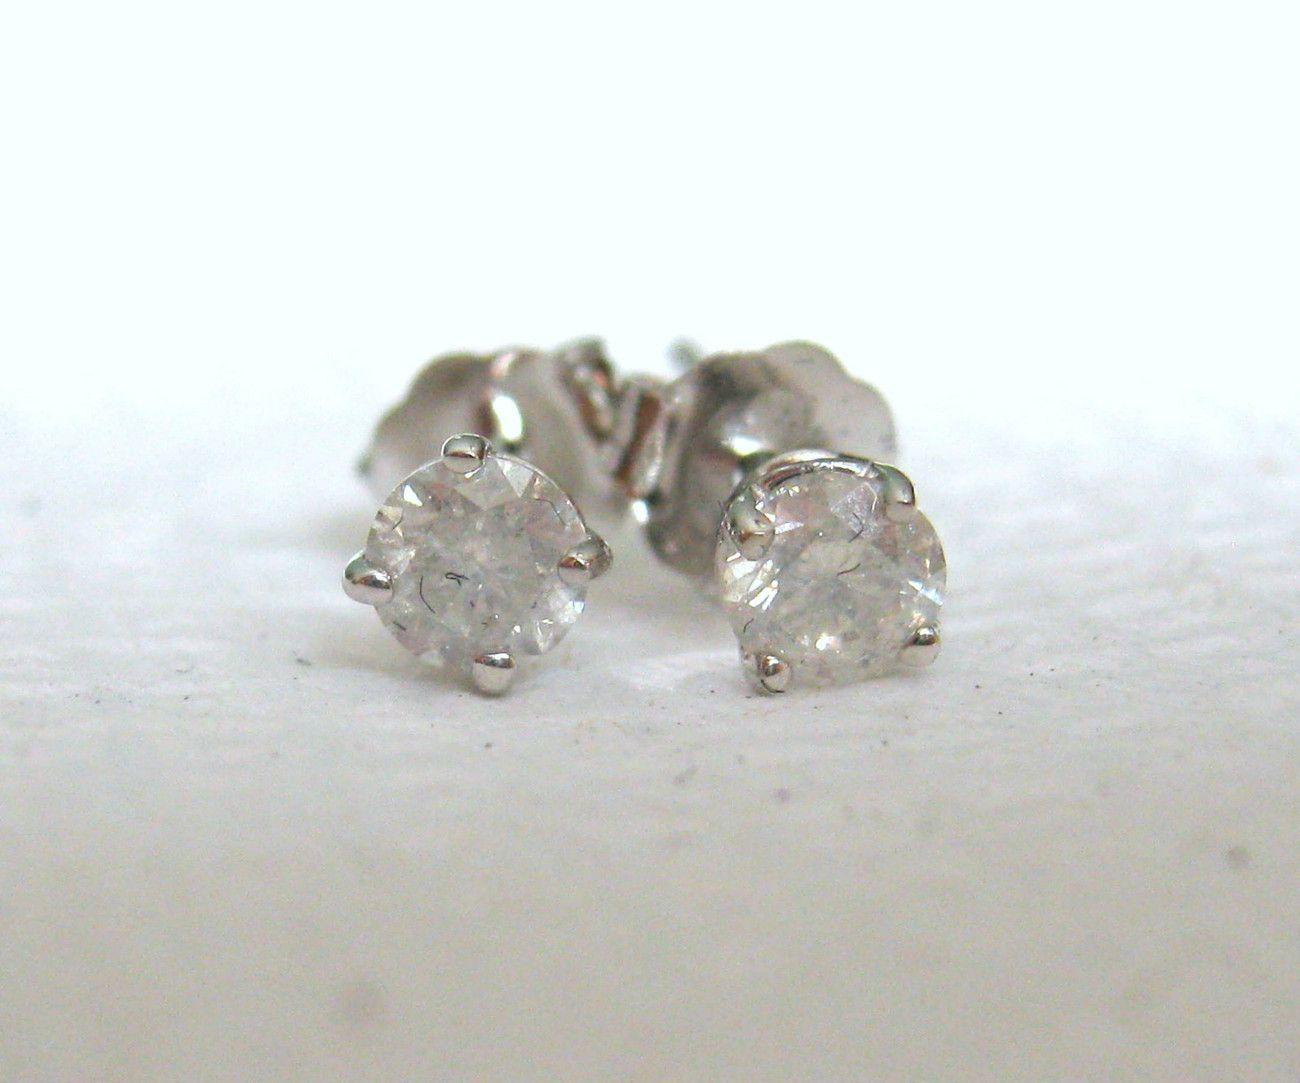 1/3 Ct Round Brilliant Cut 14K White Gold Diamond Stud Earrings - Diamond